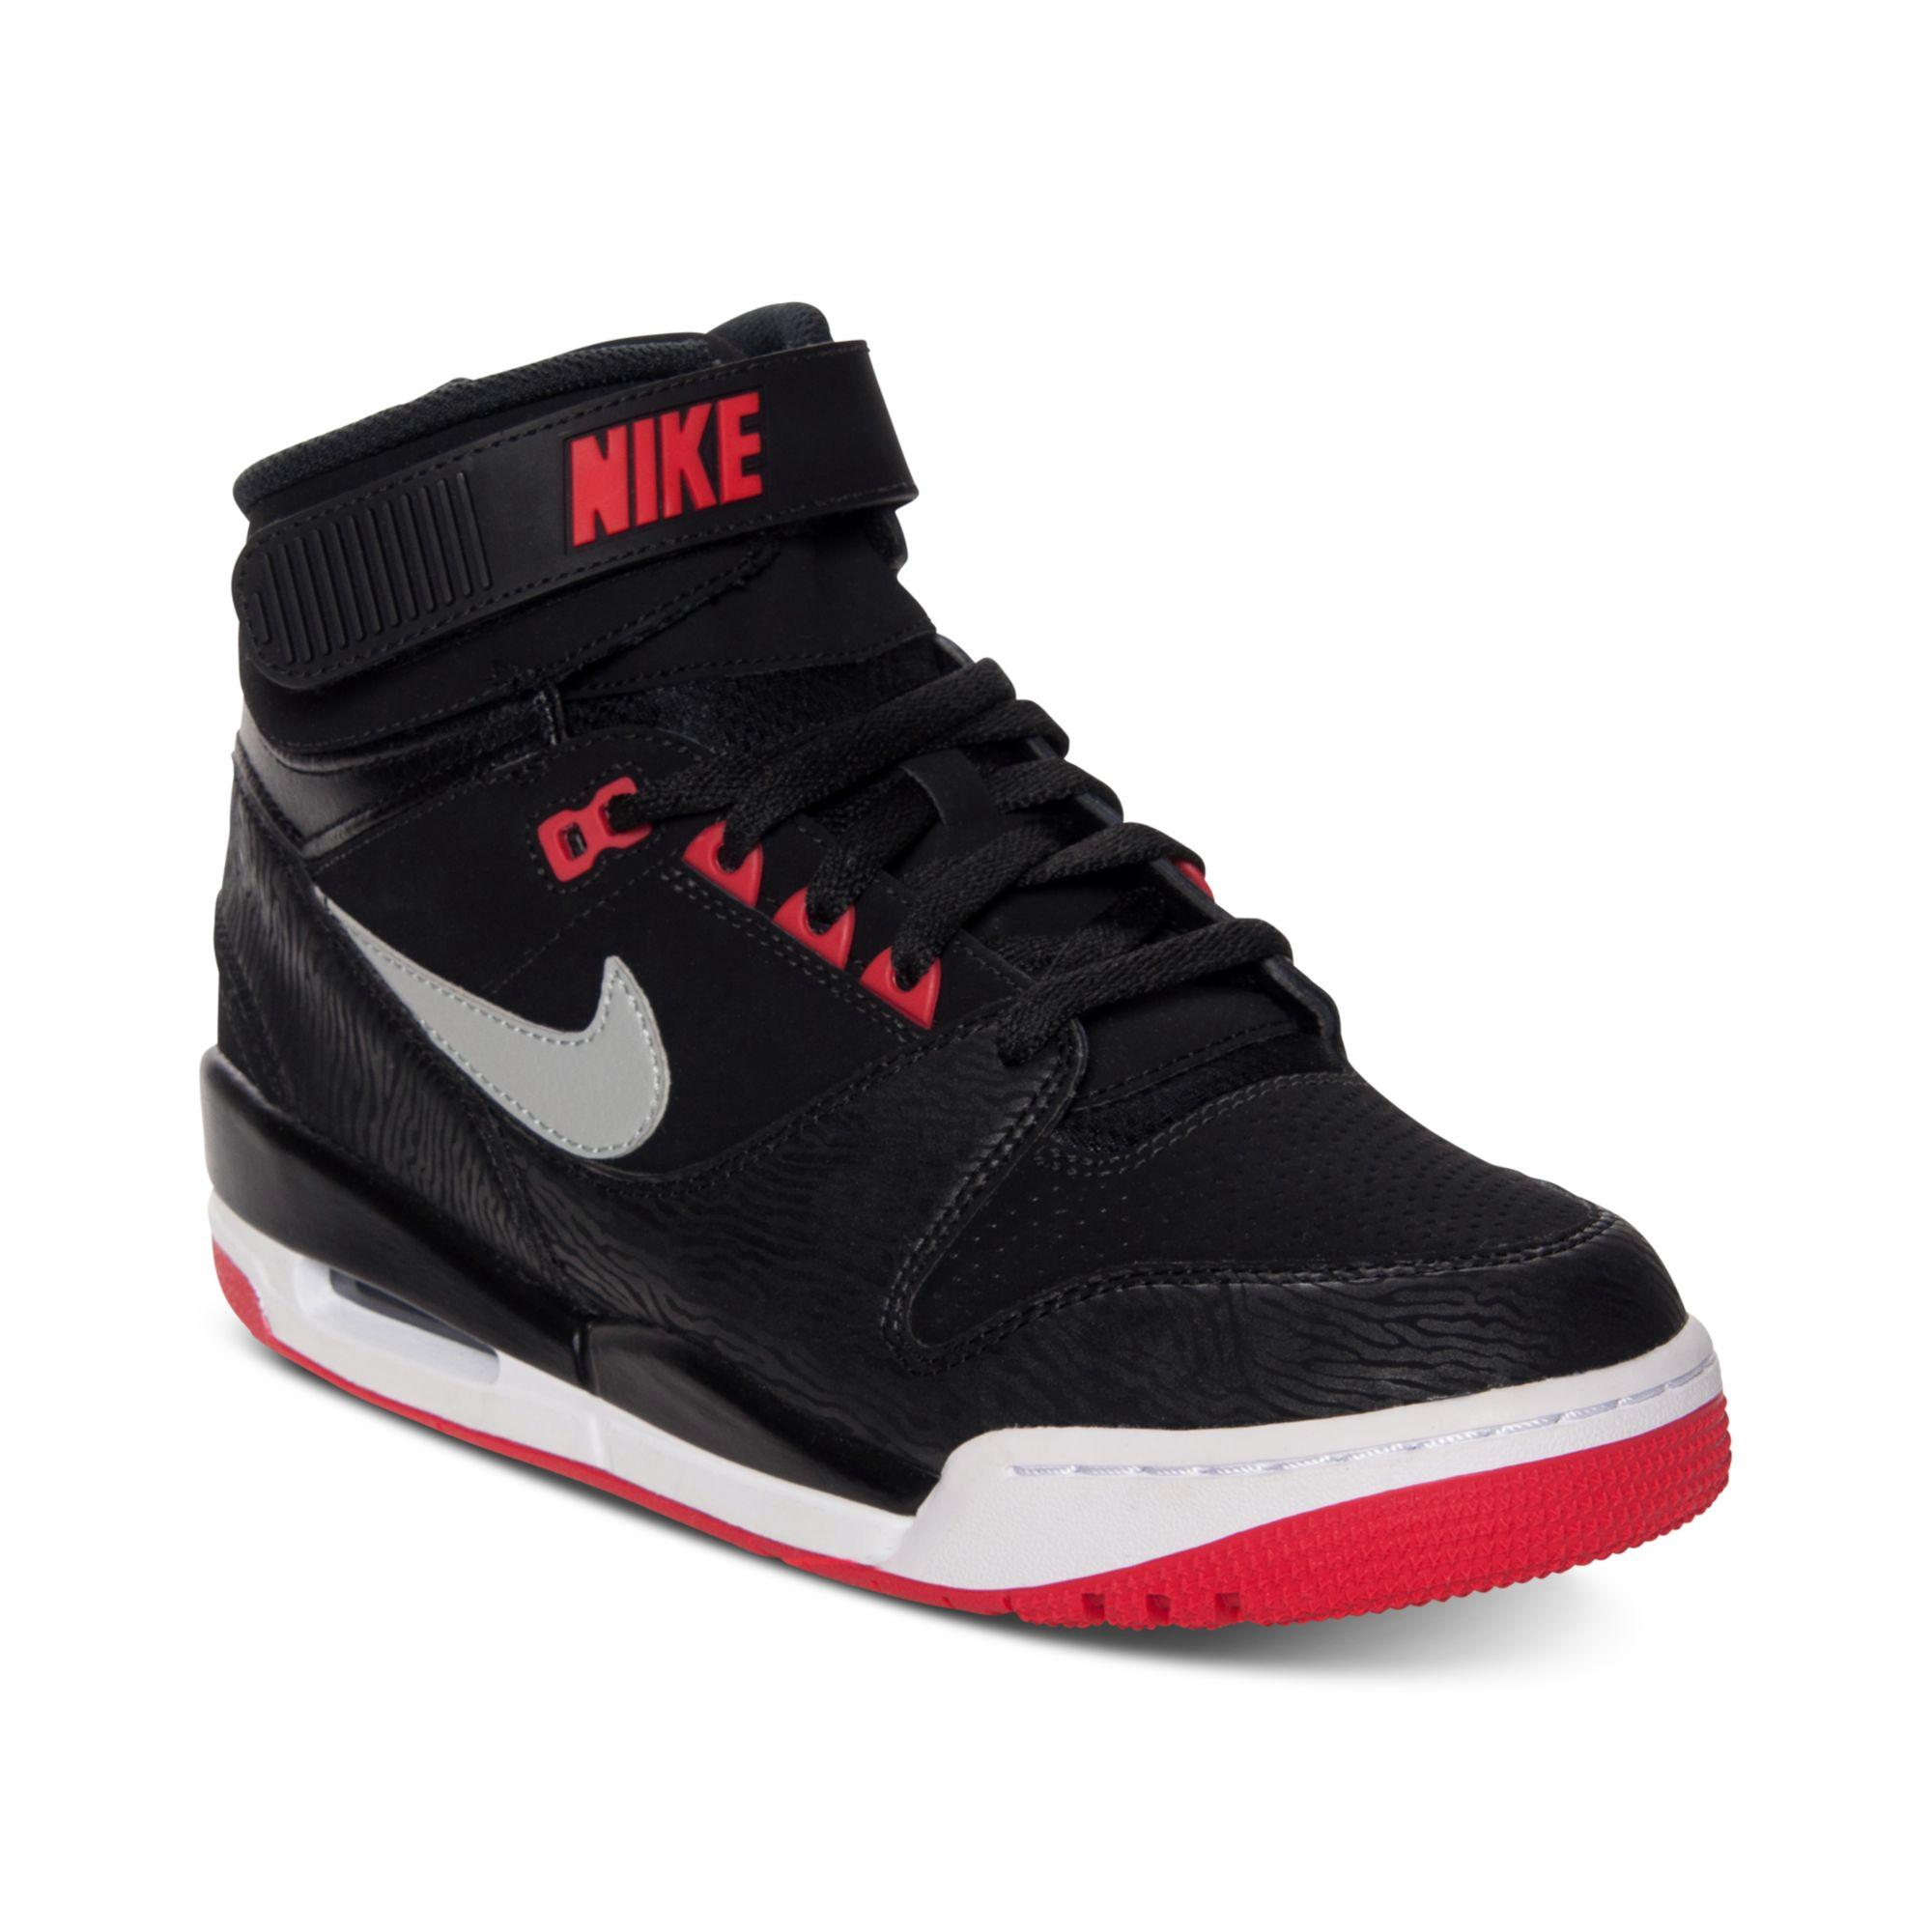 b67fc86006a08 nike revolution basketball